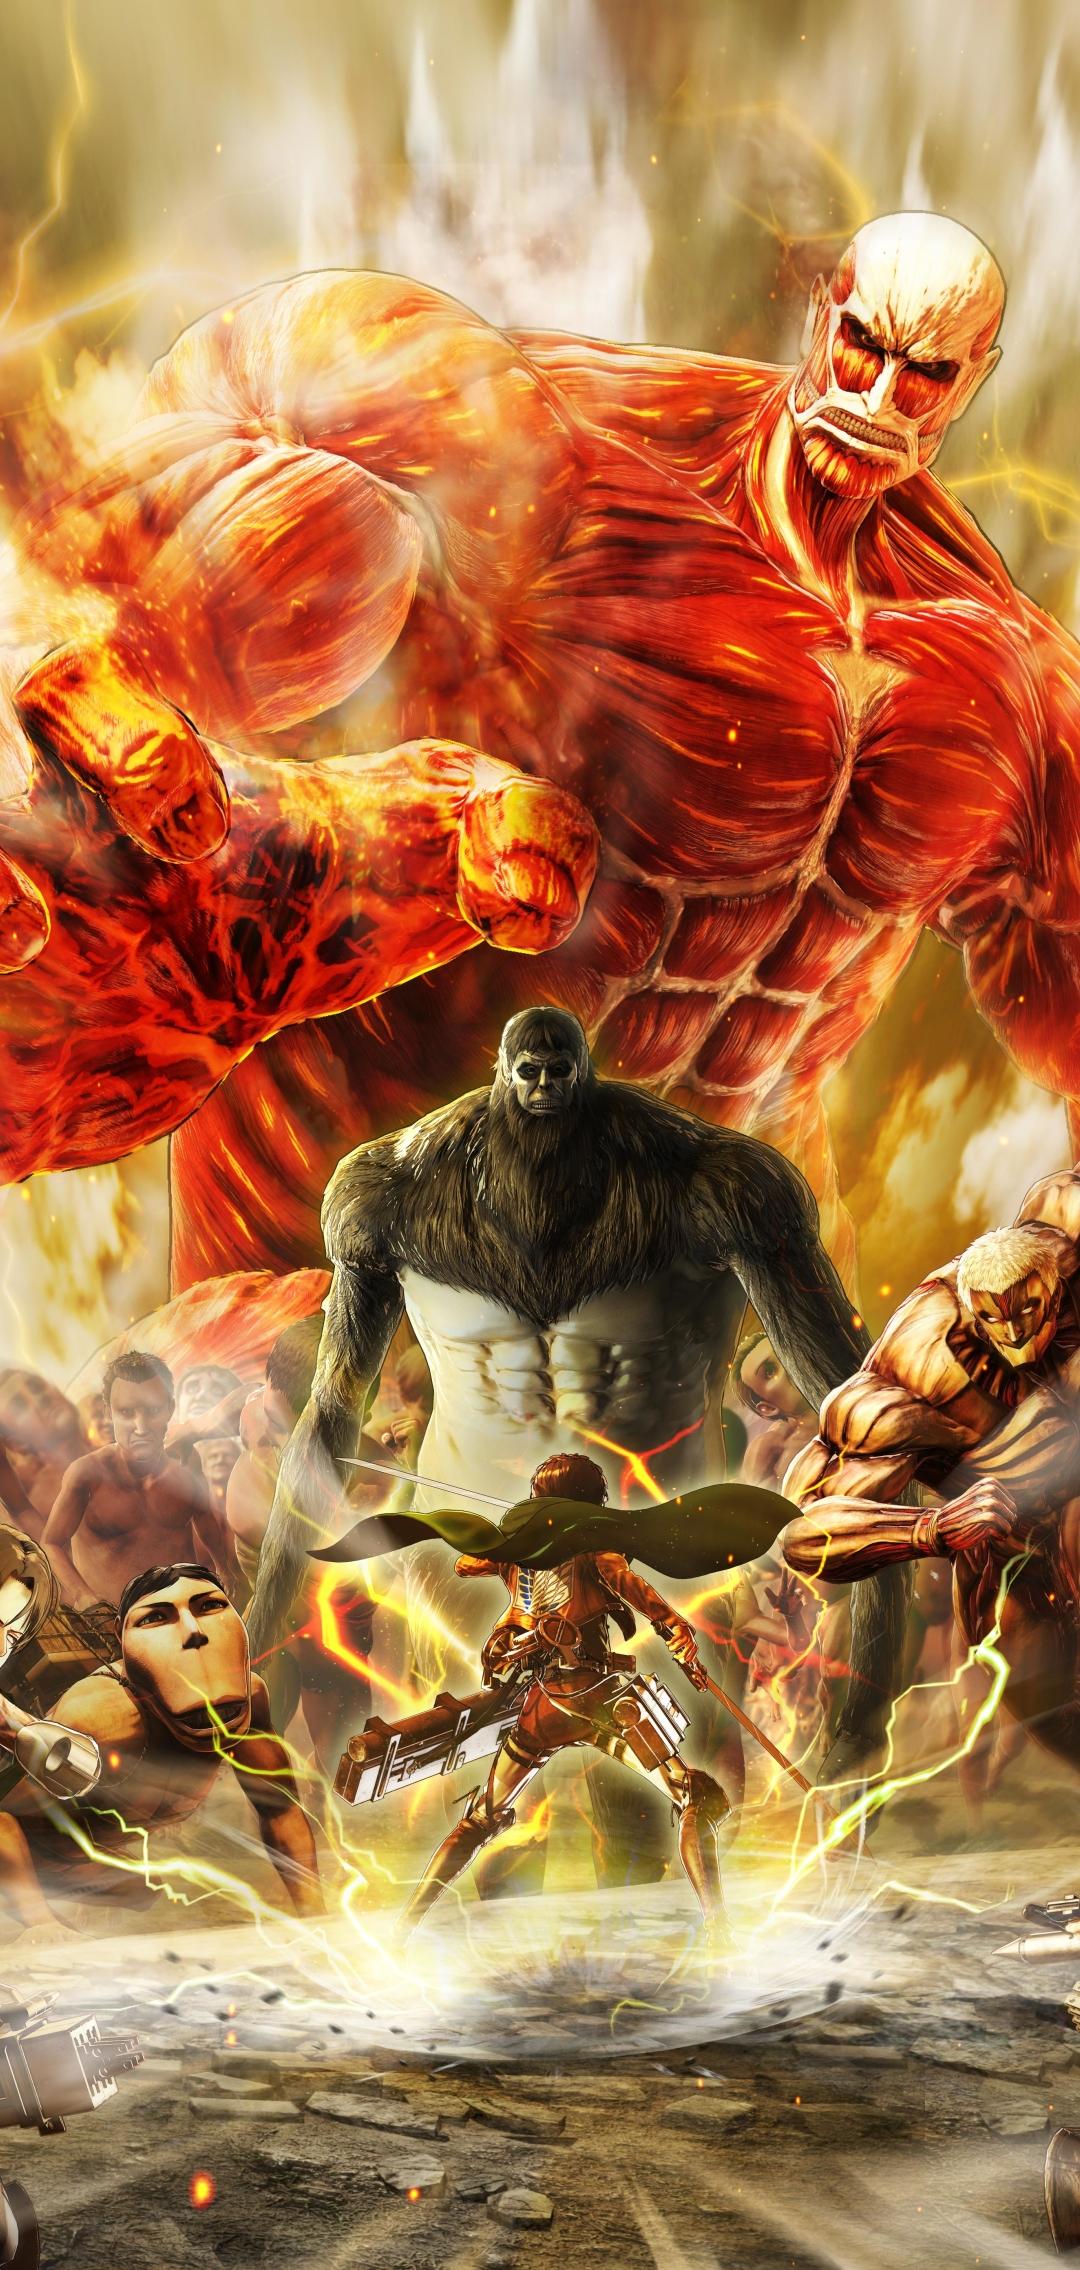 1080x2270 Attack on Titan Final Battle 1080x2270 Resolution Wallpaper, HD Games 4K Wallpapers ...